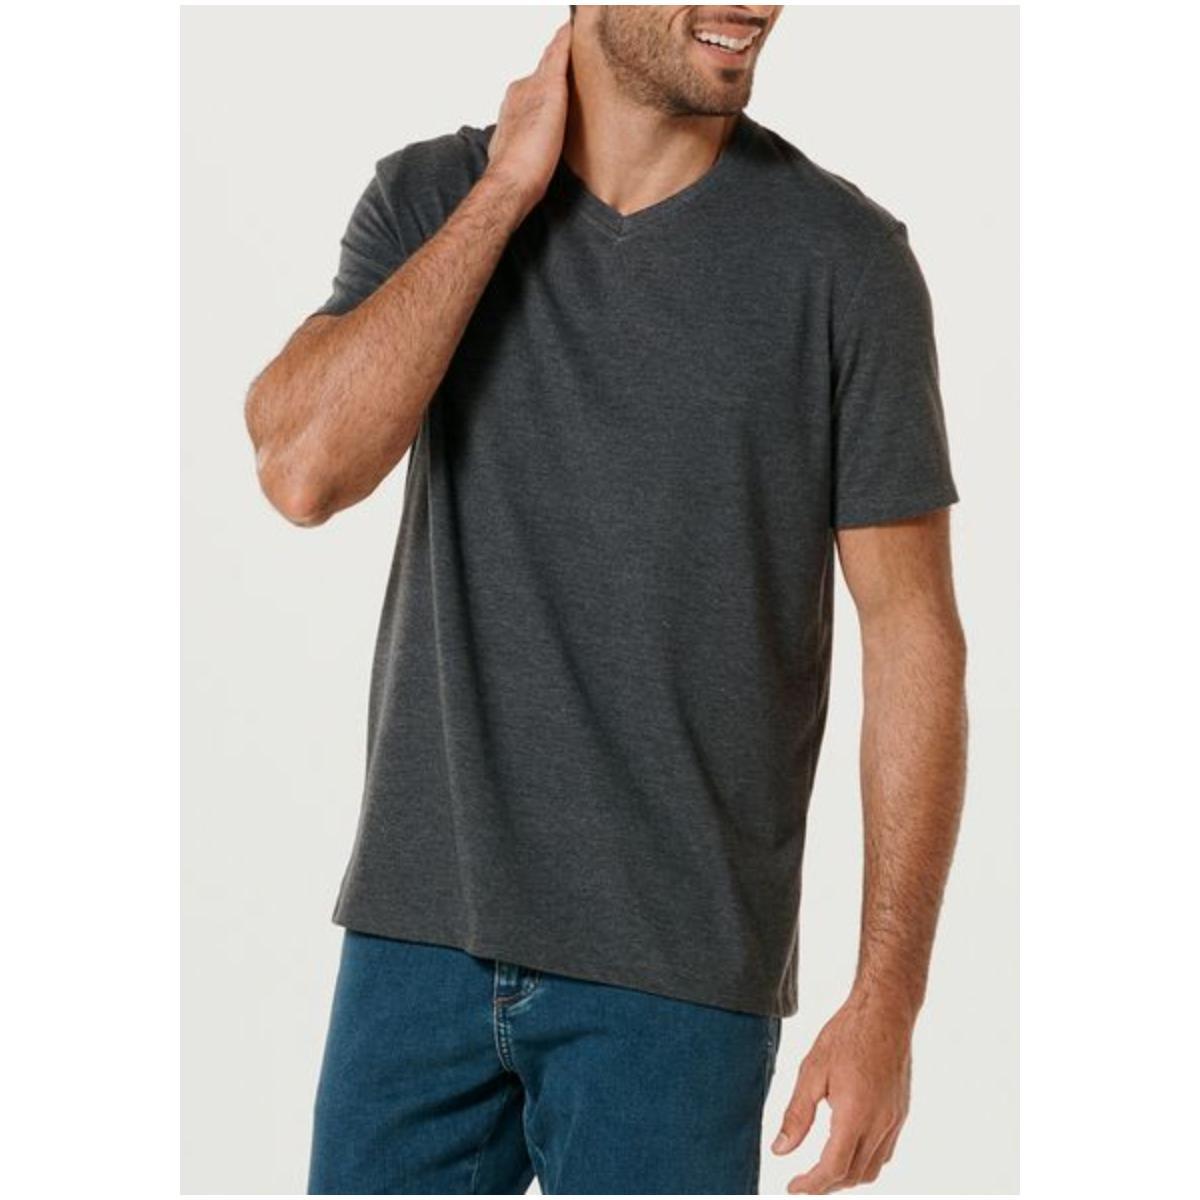 Camiseta Masculina Hering 022b Md307s Chumbo